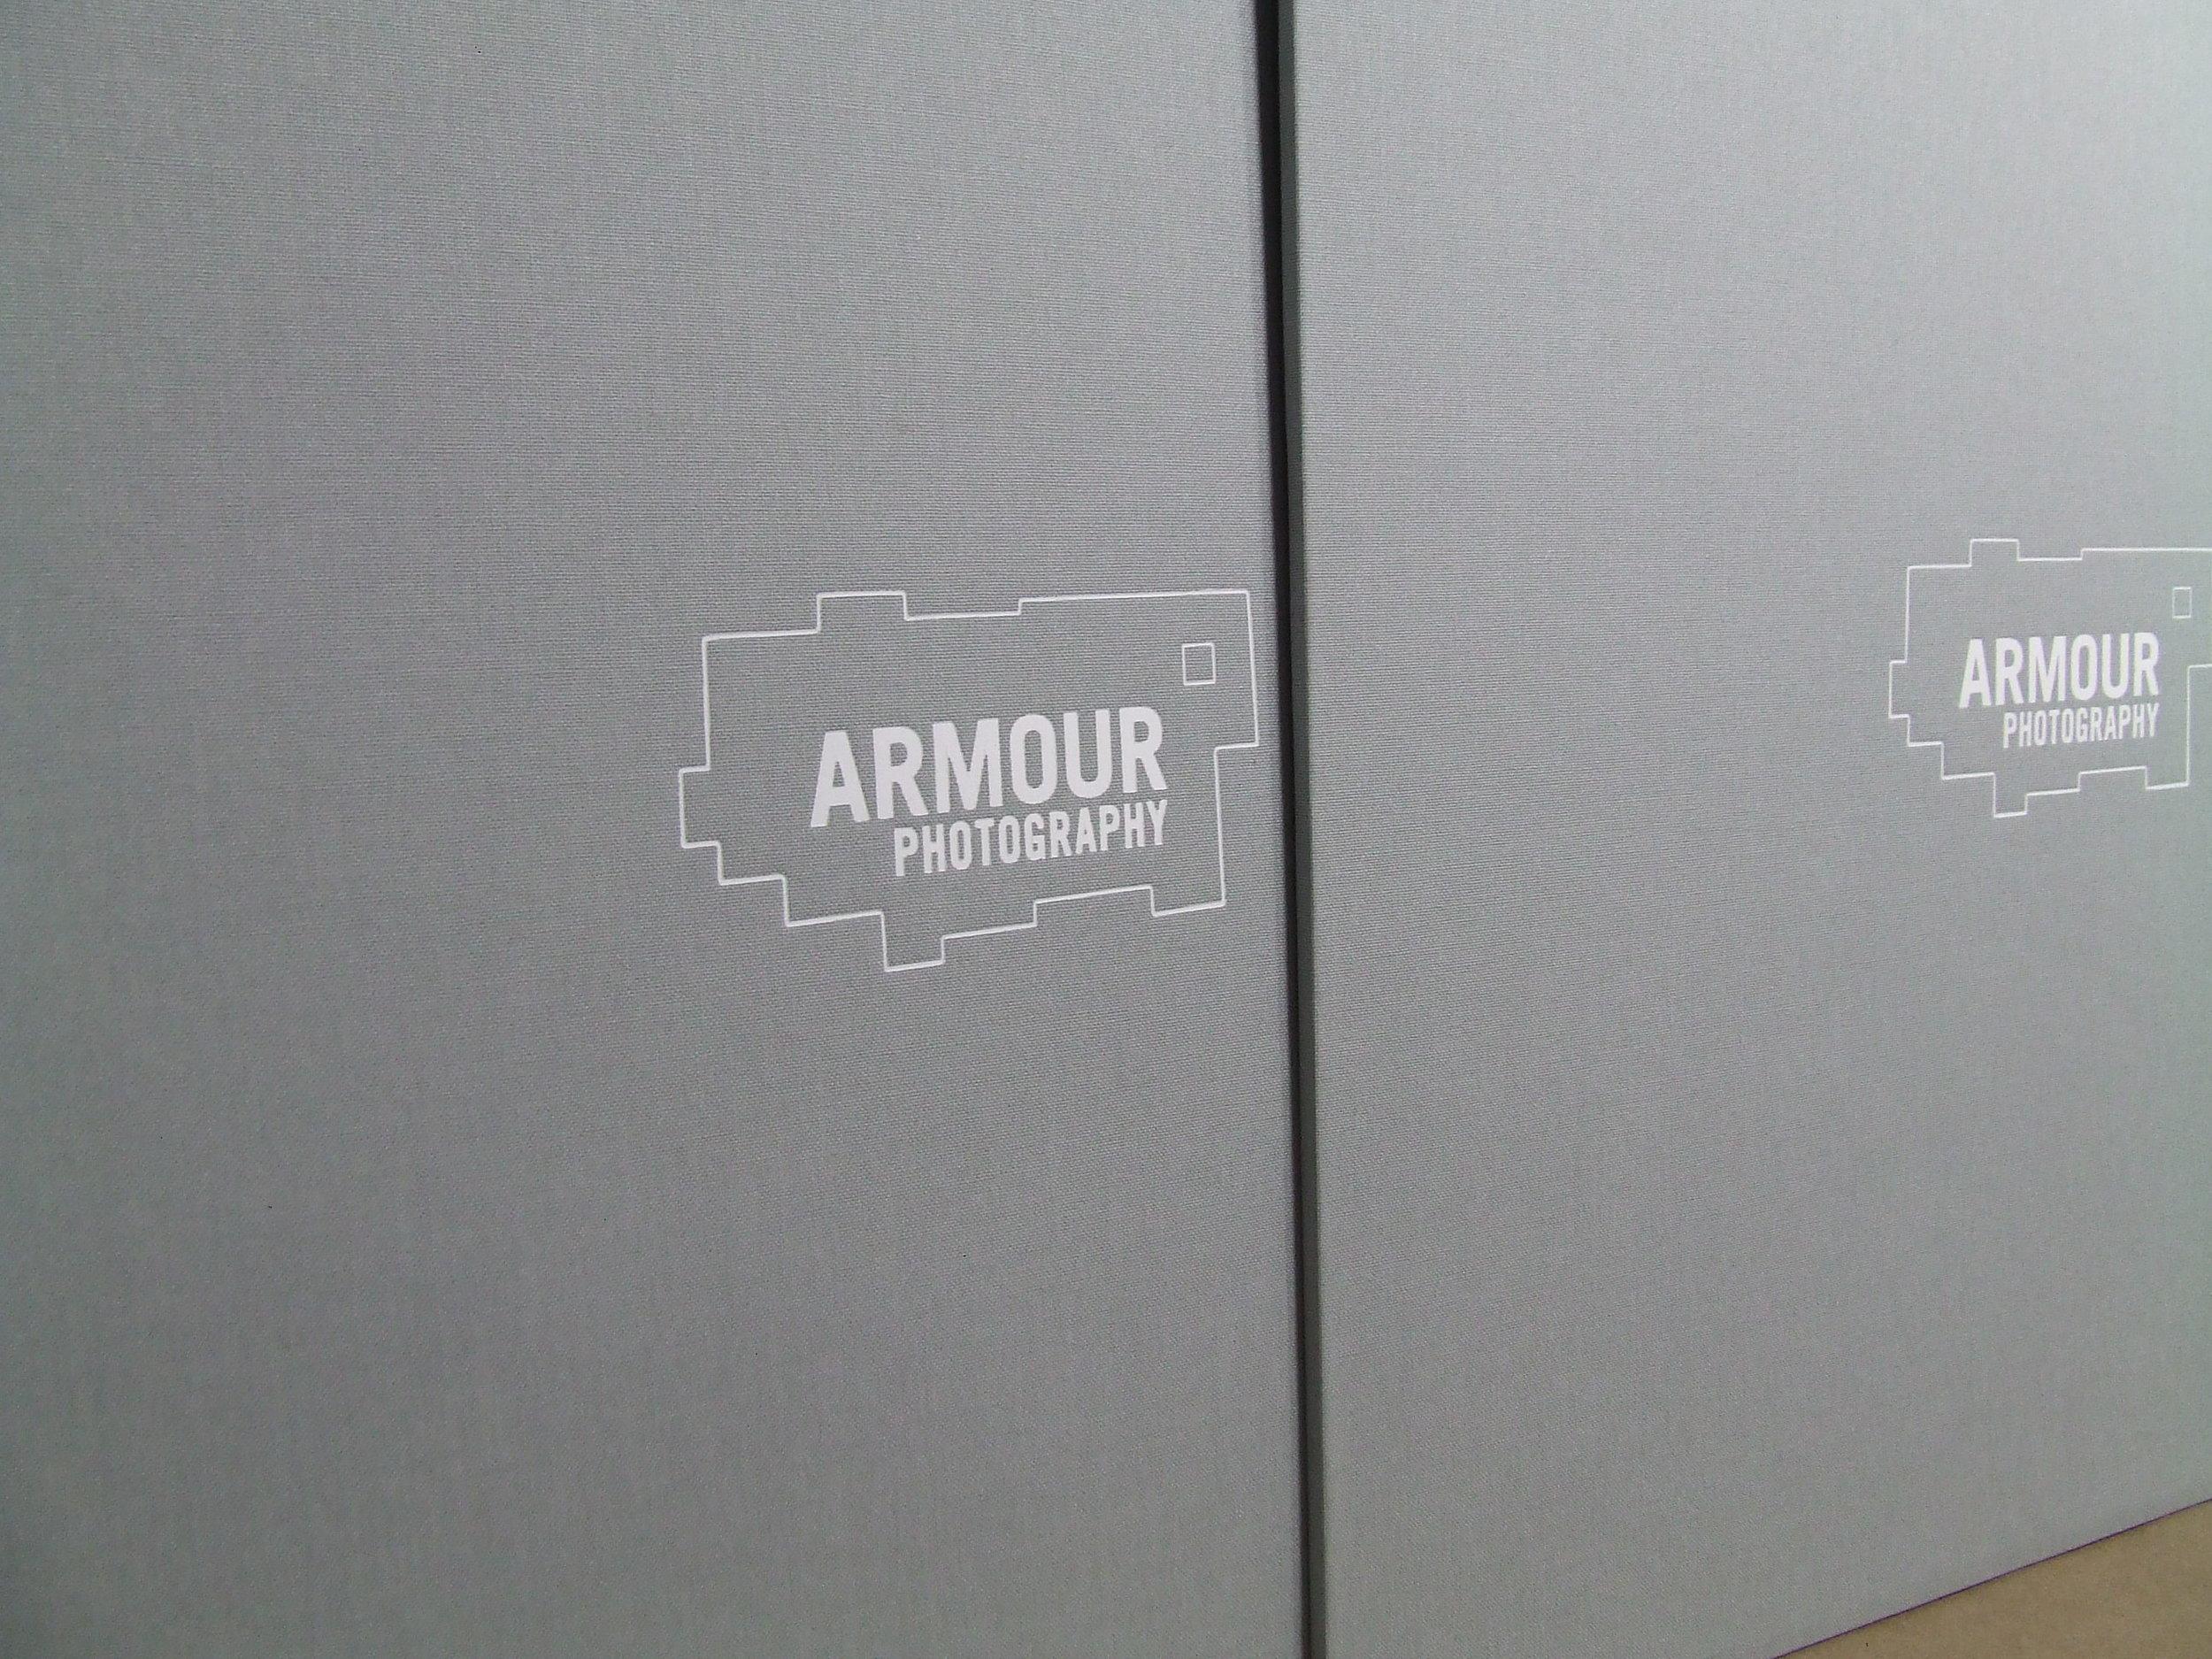 armour-photo-02.jpg